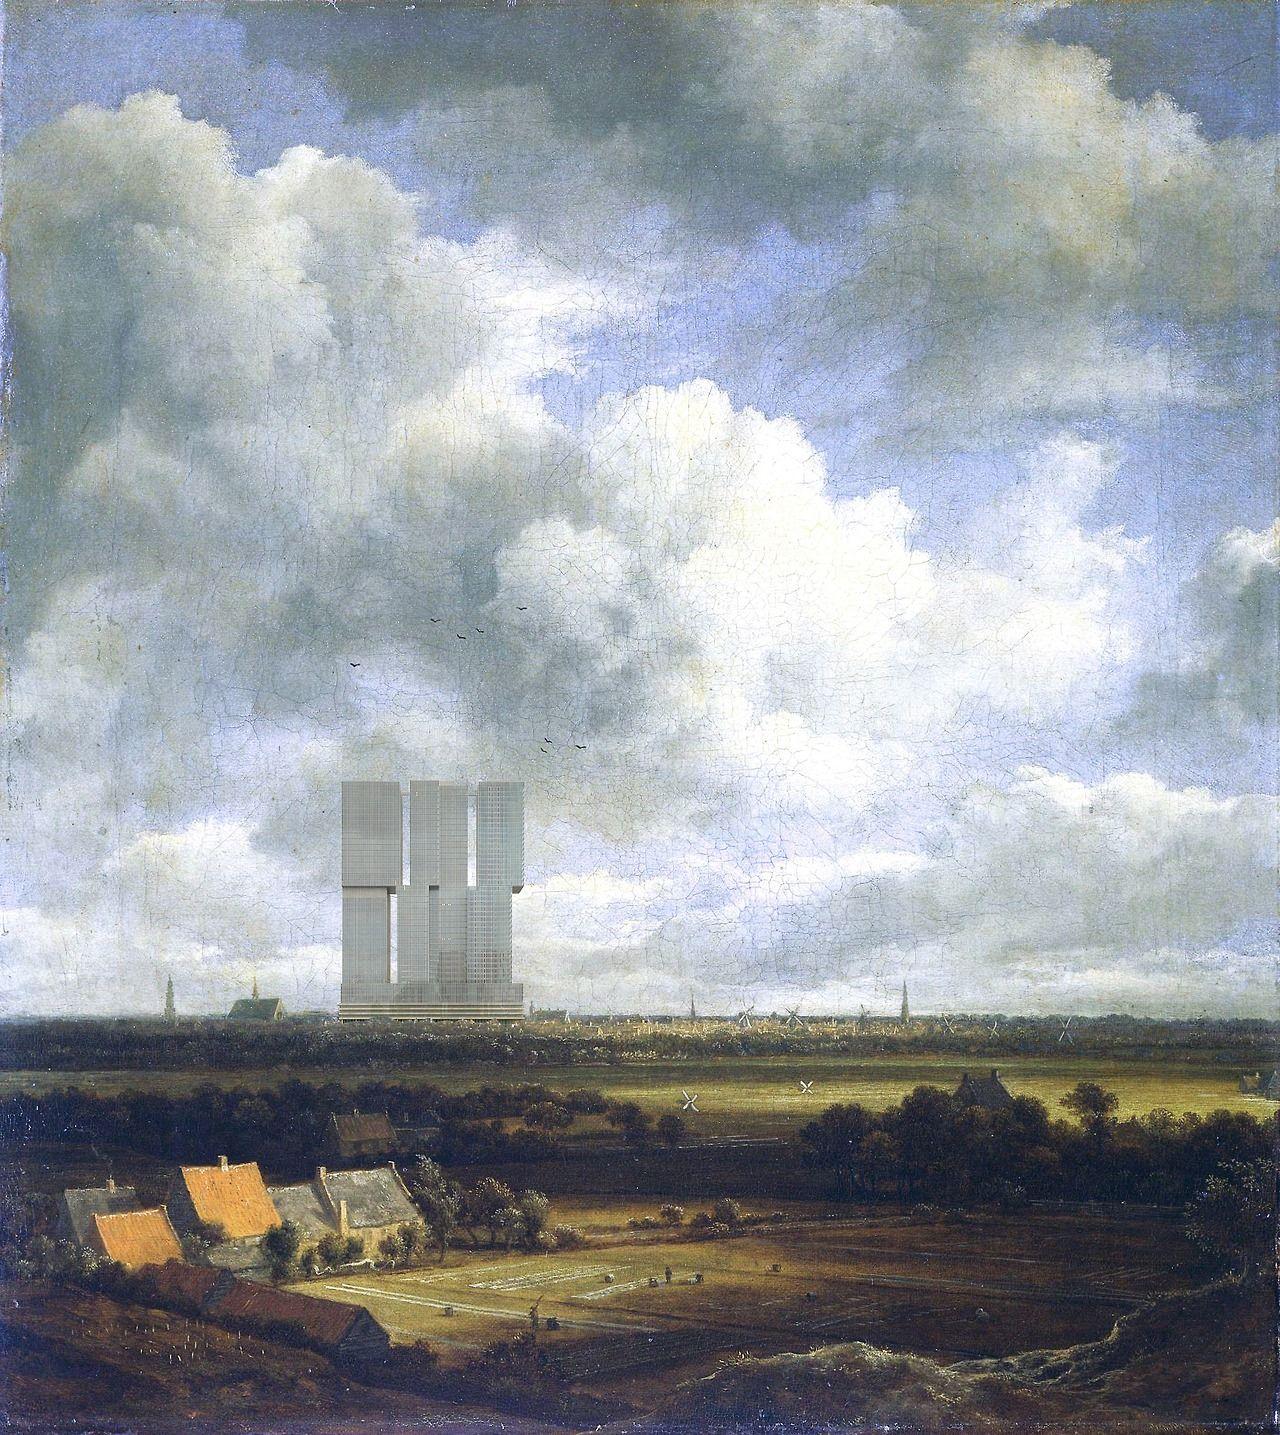 Alles ist Kontext (depends on the context),  View of Haarlem,  Jacob Isaacksz van Ruisdael, c. 1670 (The Rotterdam by Rem Koolhaas) (c)Davide Tommaso Ferrando 1,280×1,435 pixels